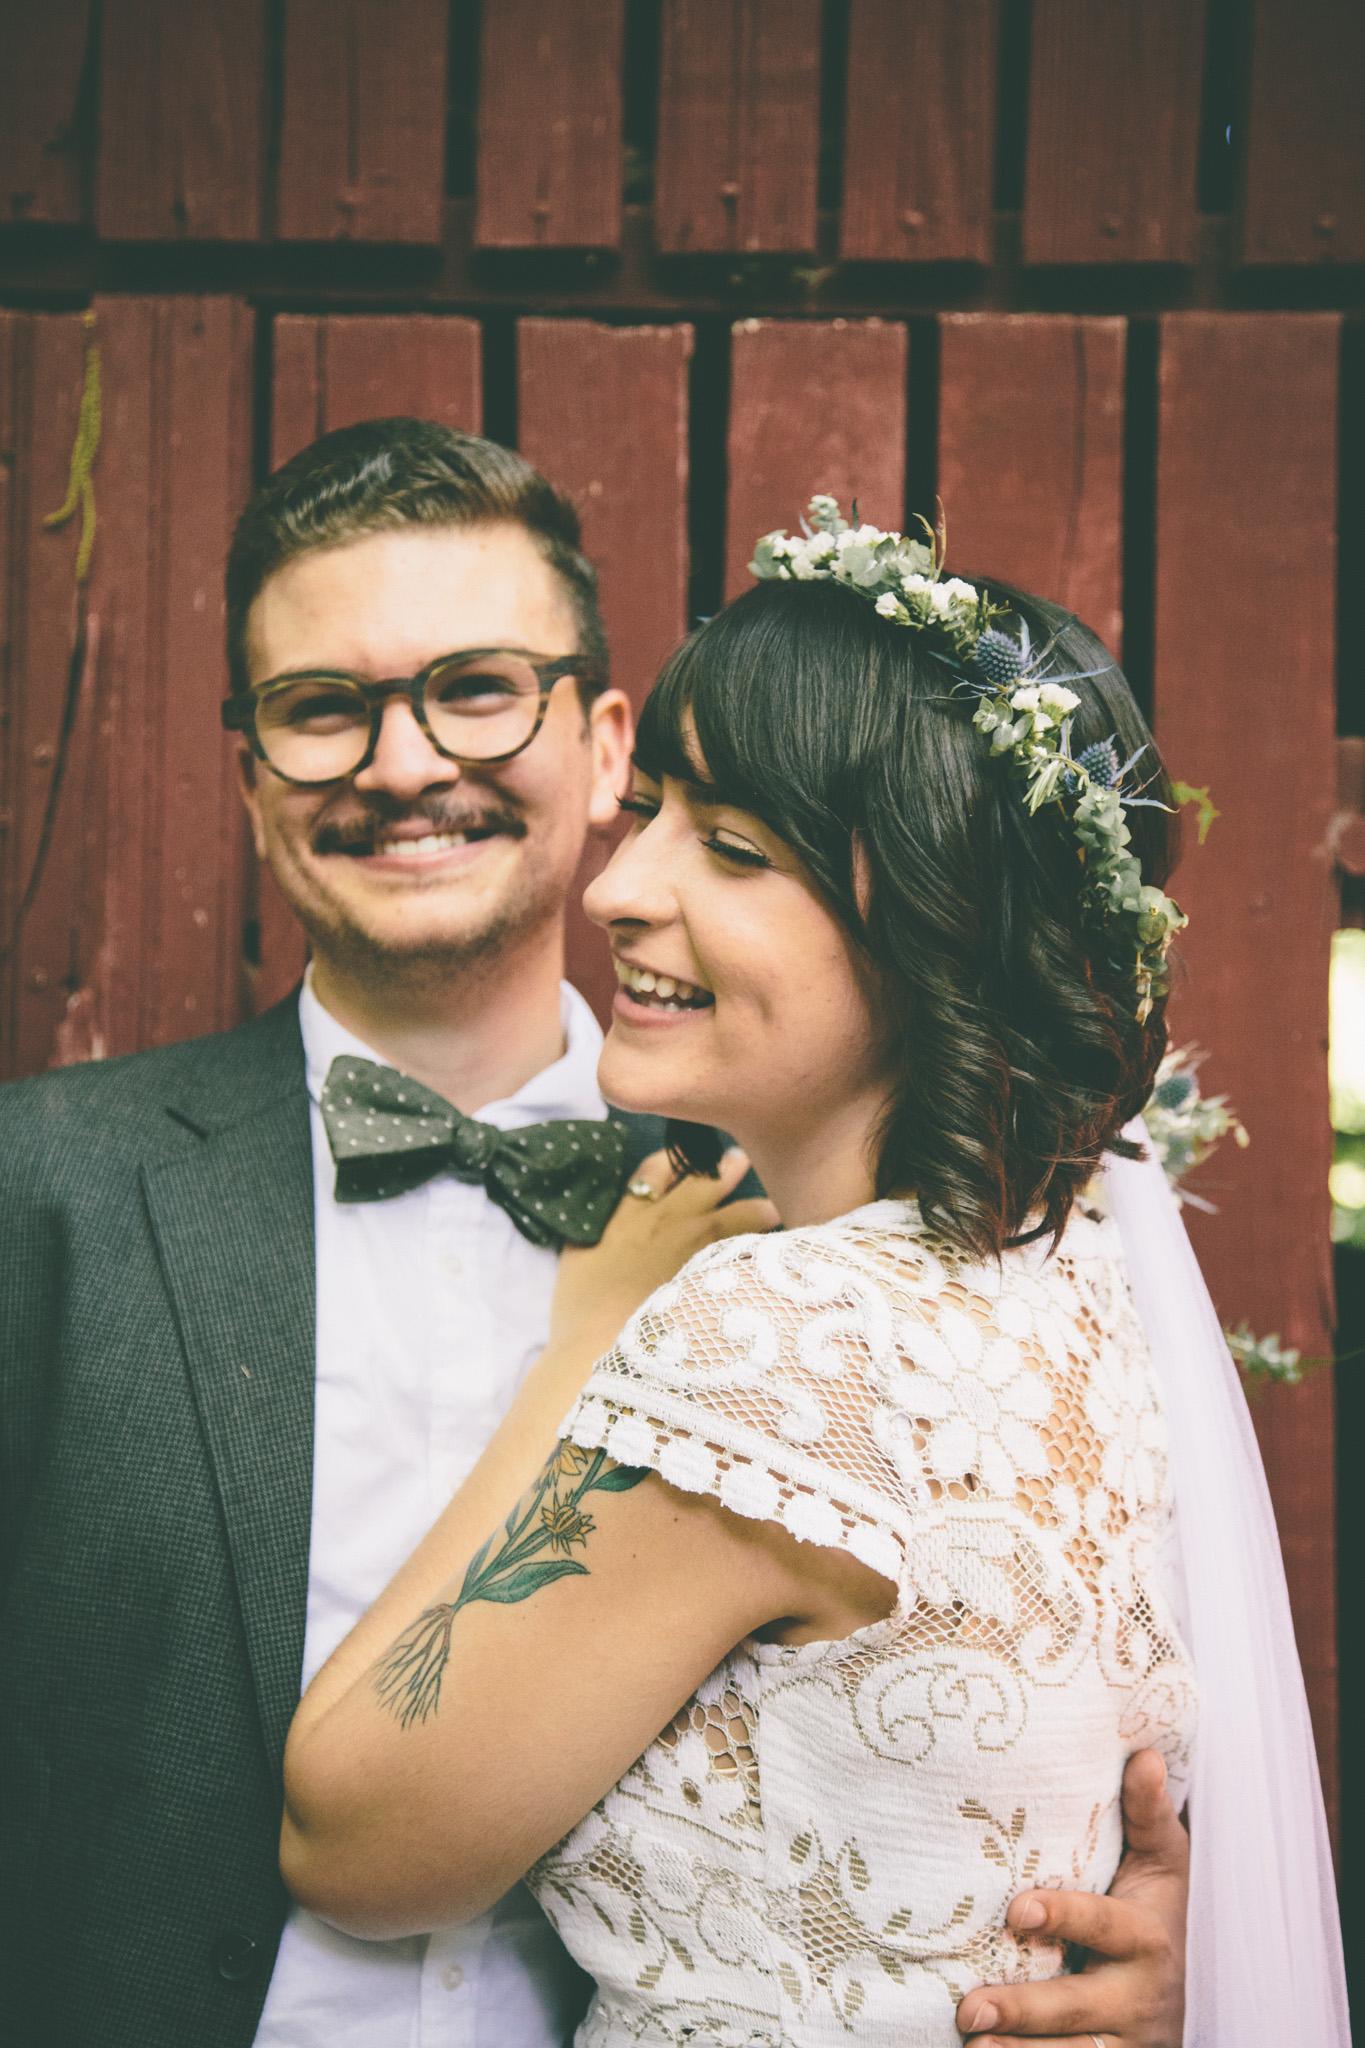 Aparo Wedding - Diana Ascarrunz Photography (4 of 5).jpg